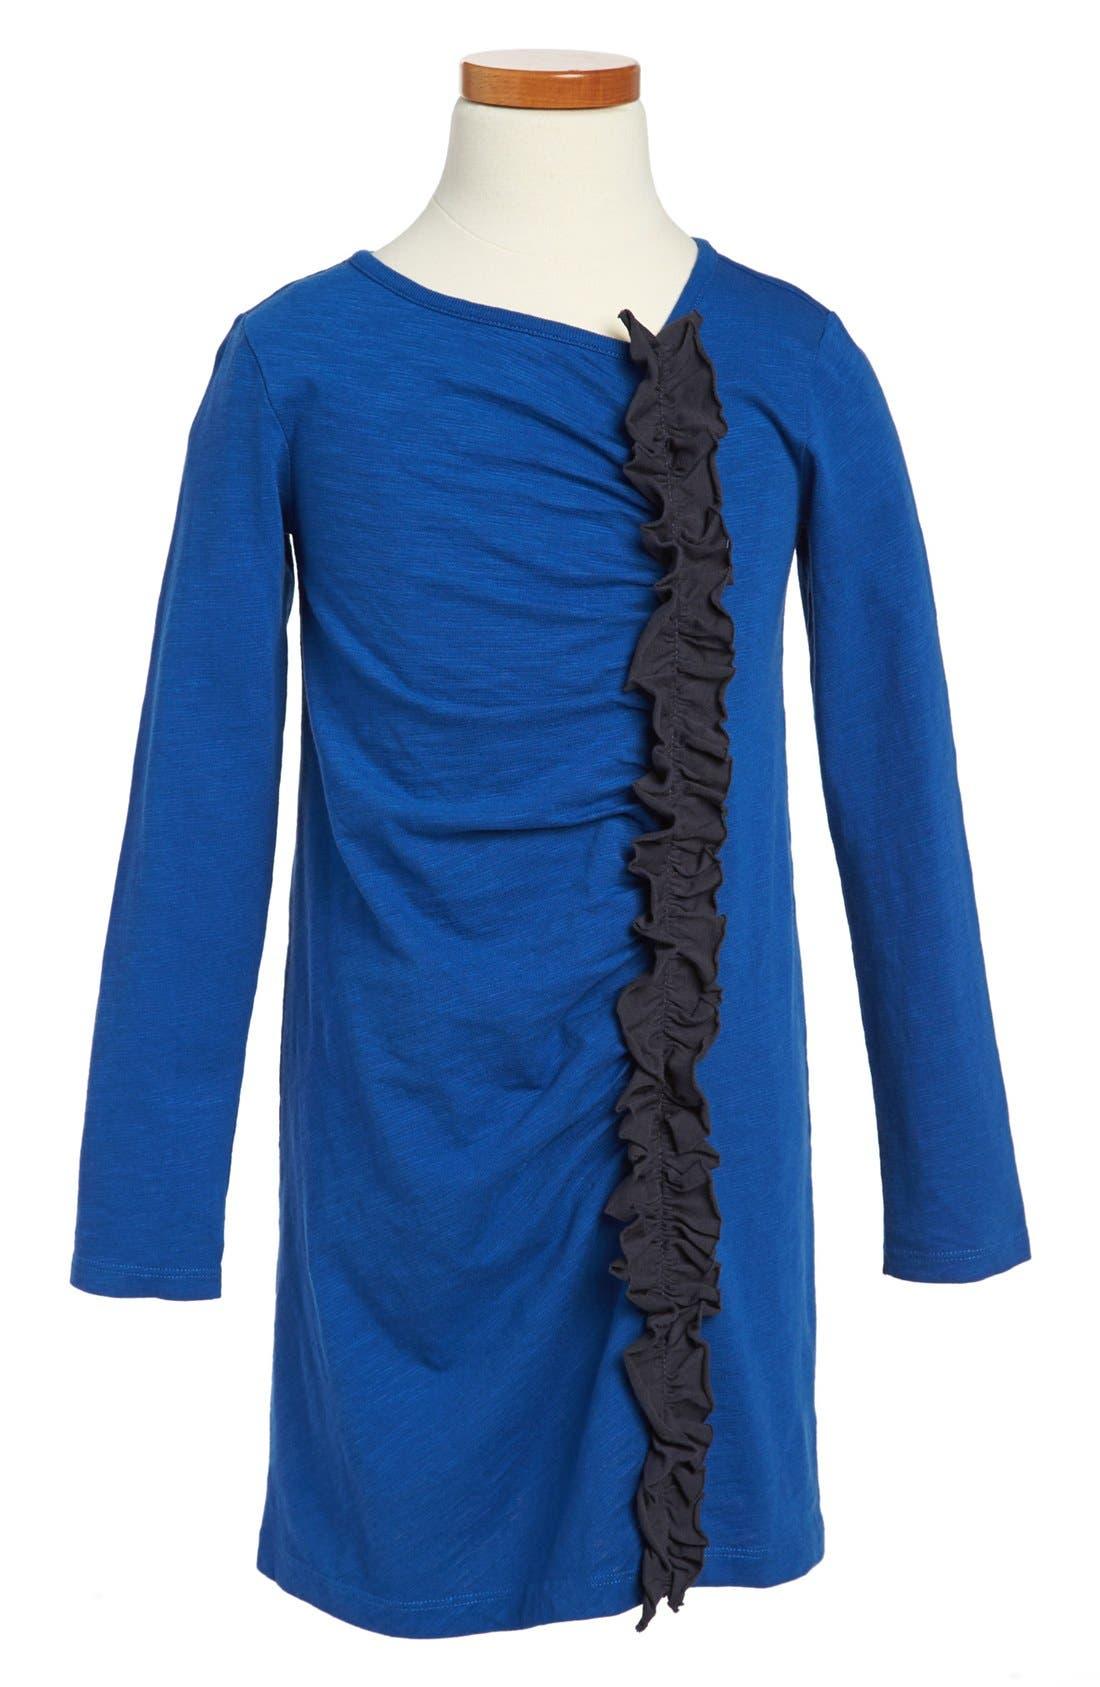 Main Image - Tea Collection Ruffled Shift Dress (Little Girls & Big Girls)